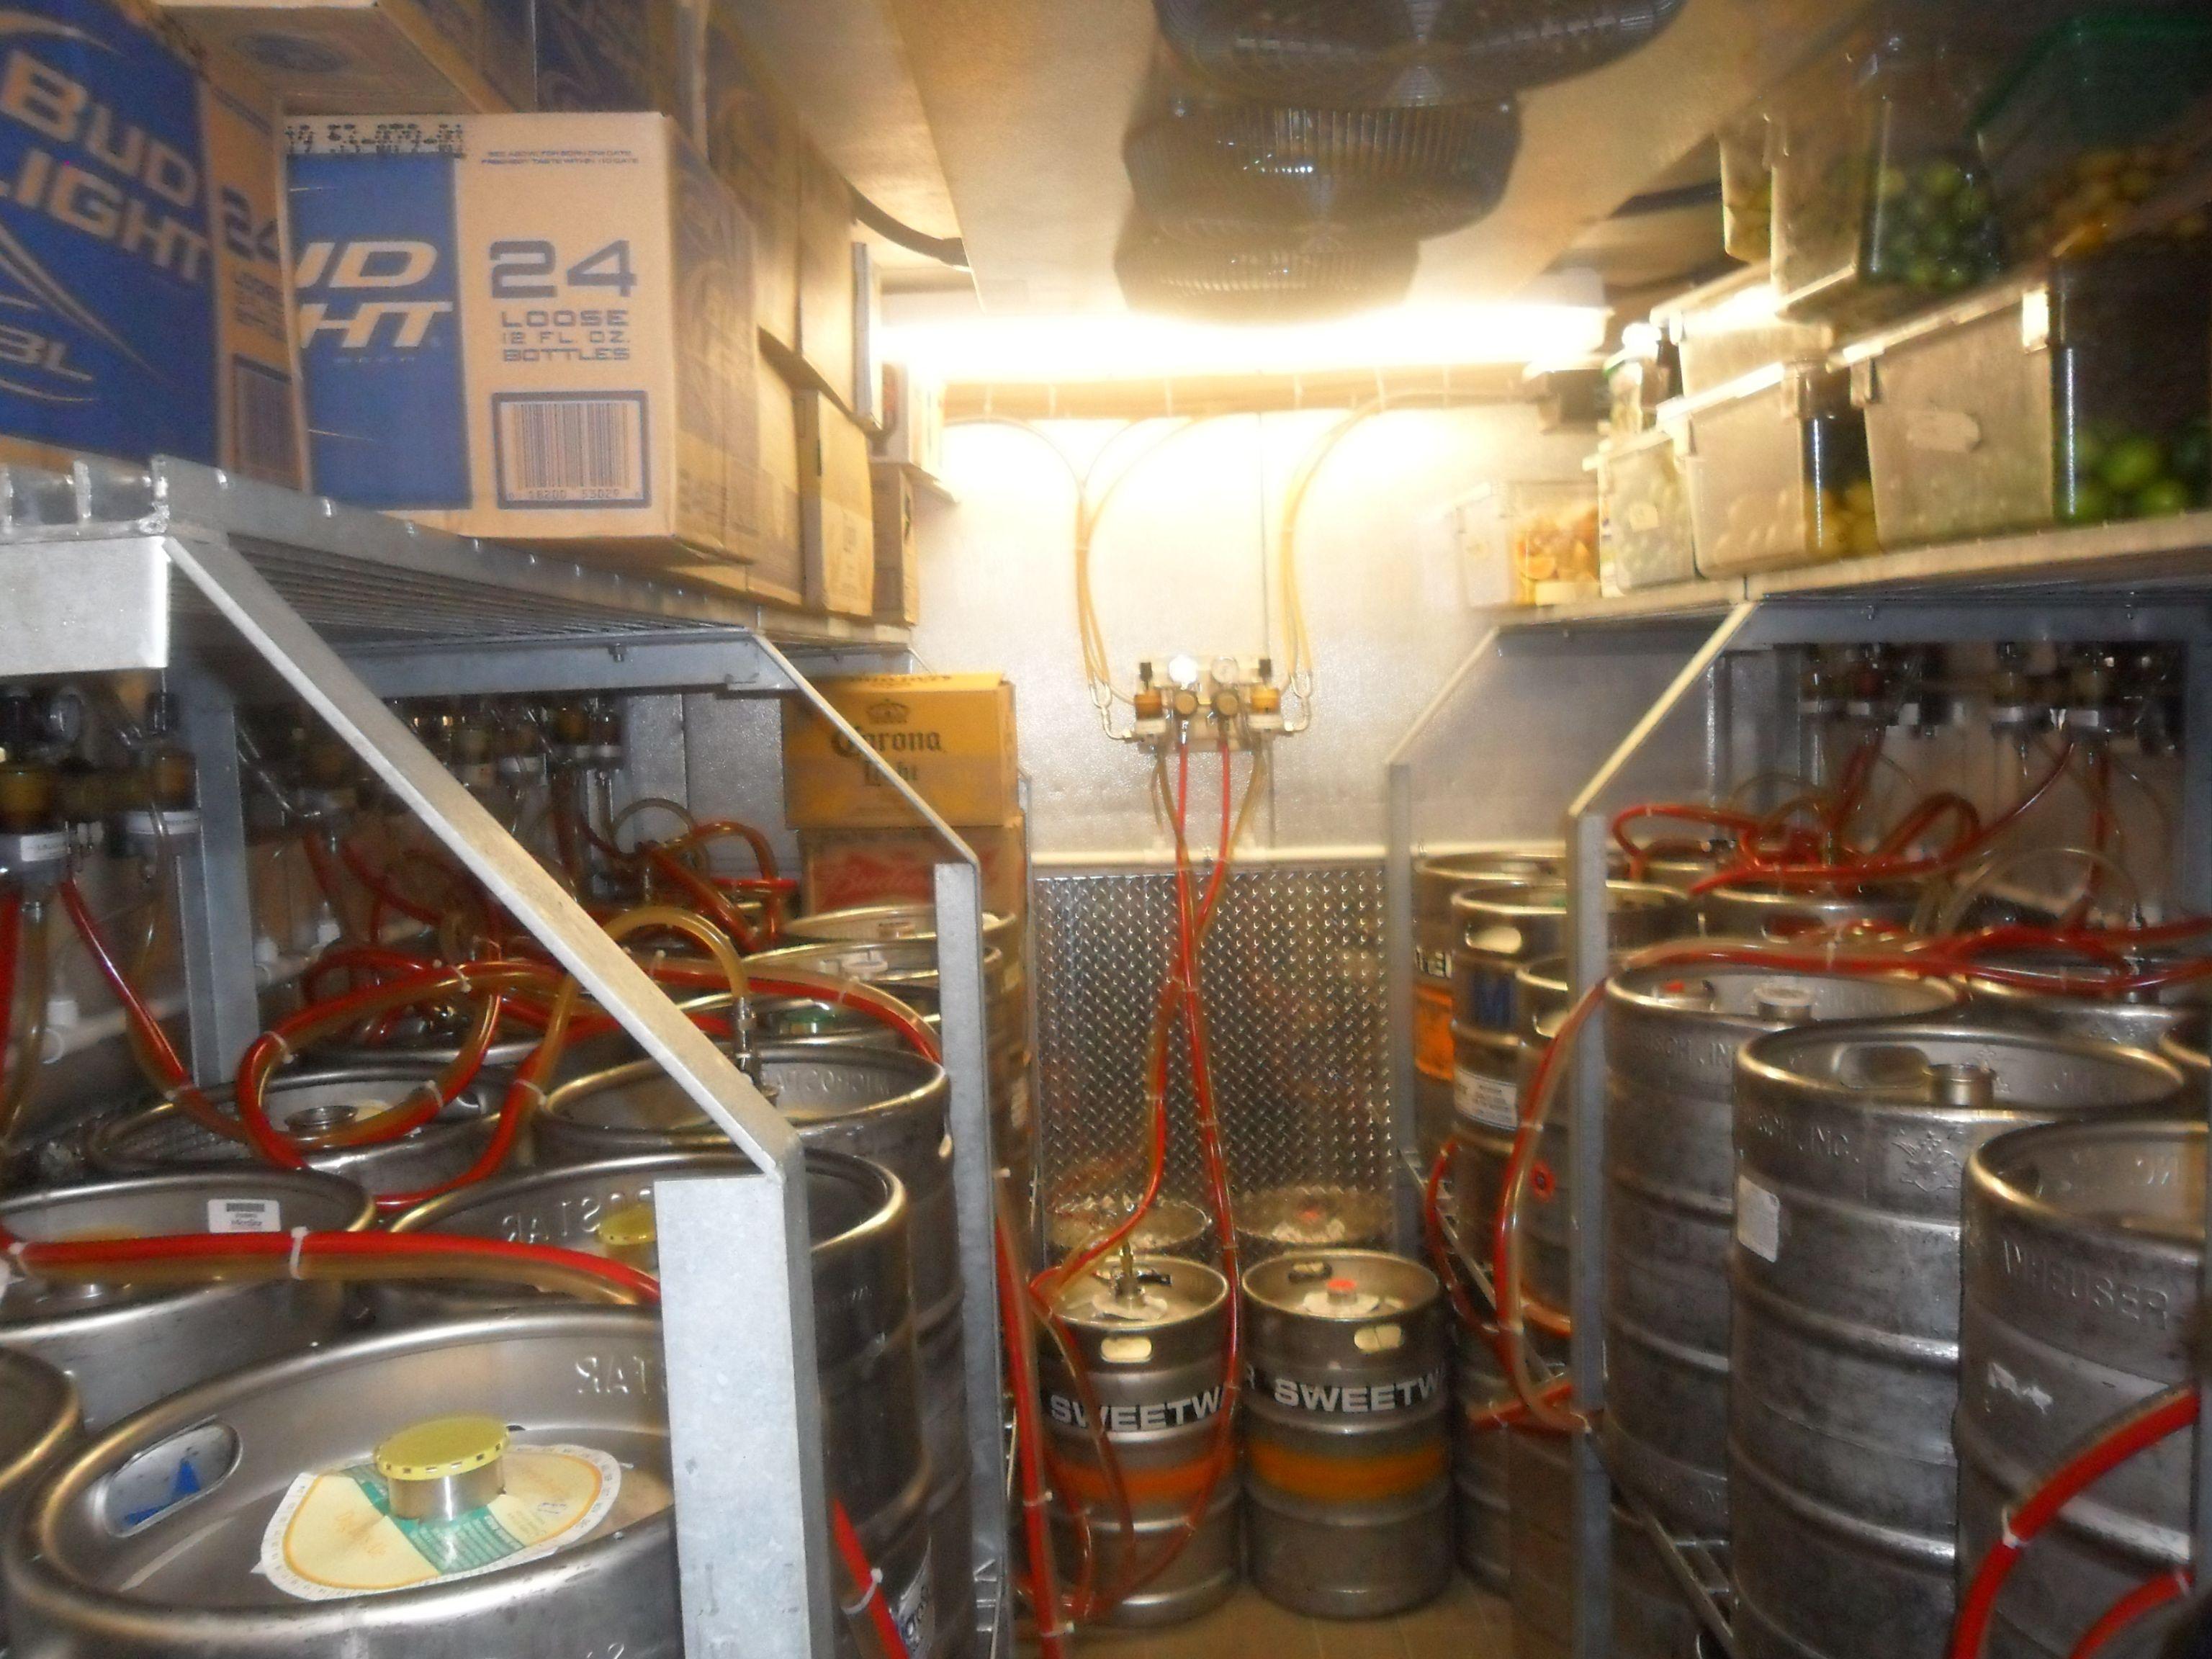 best beer keg walk in cooler - Google Search